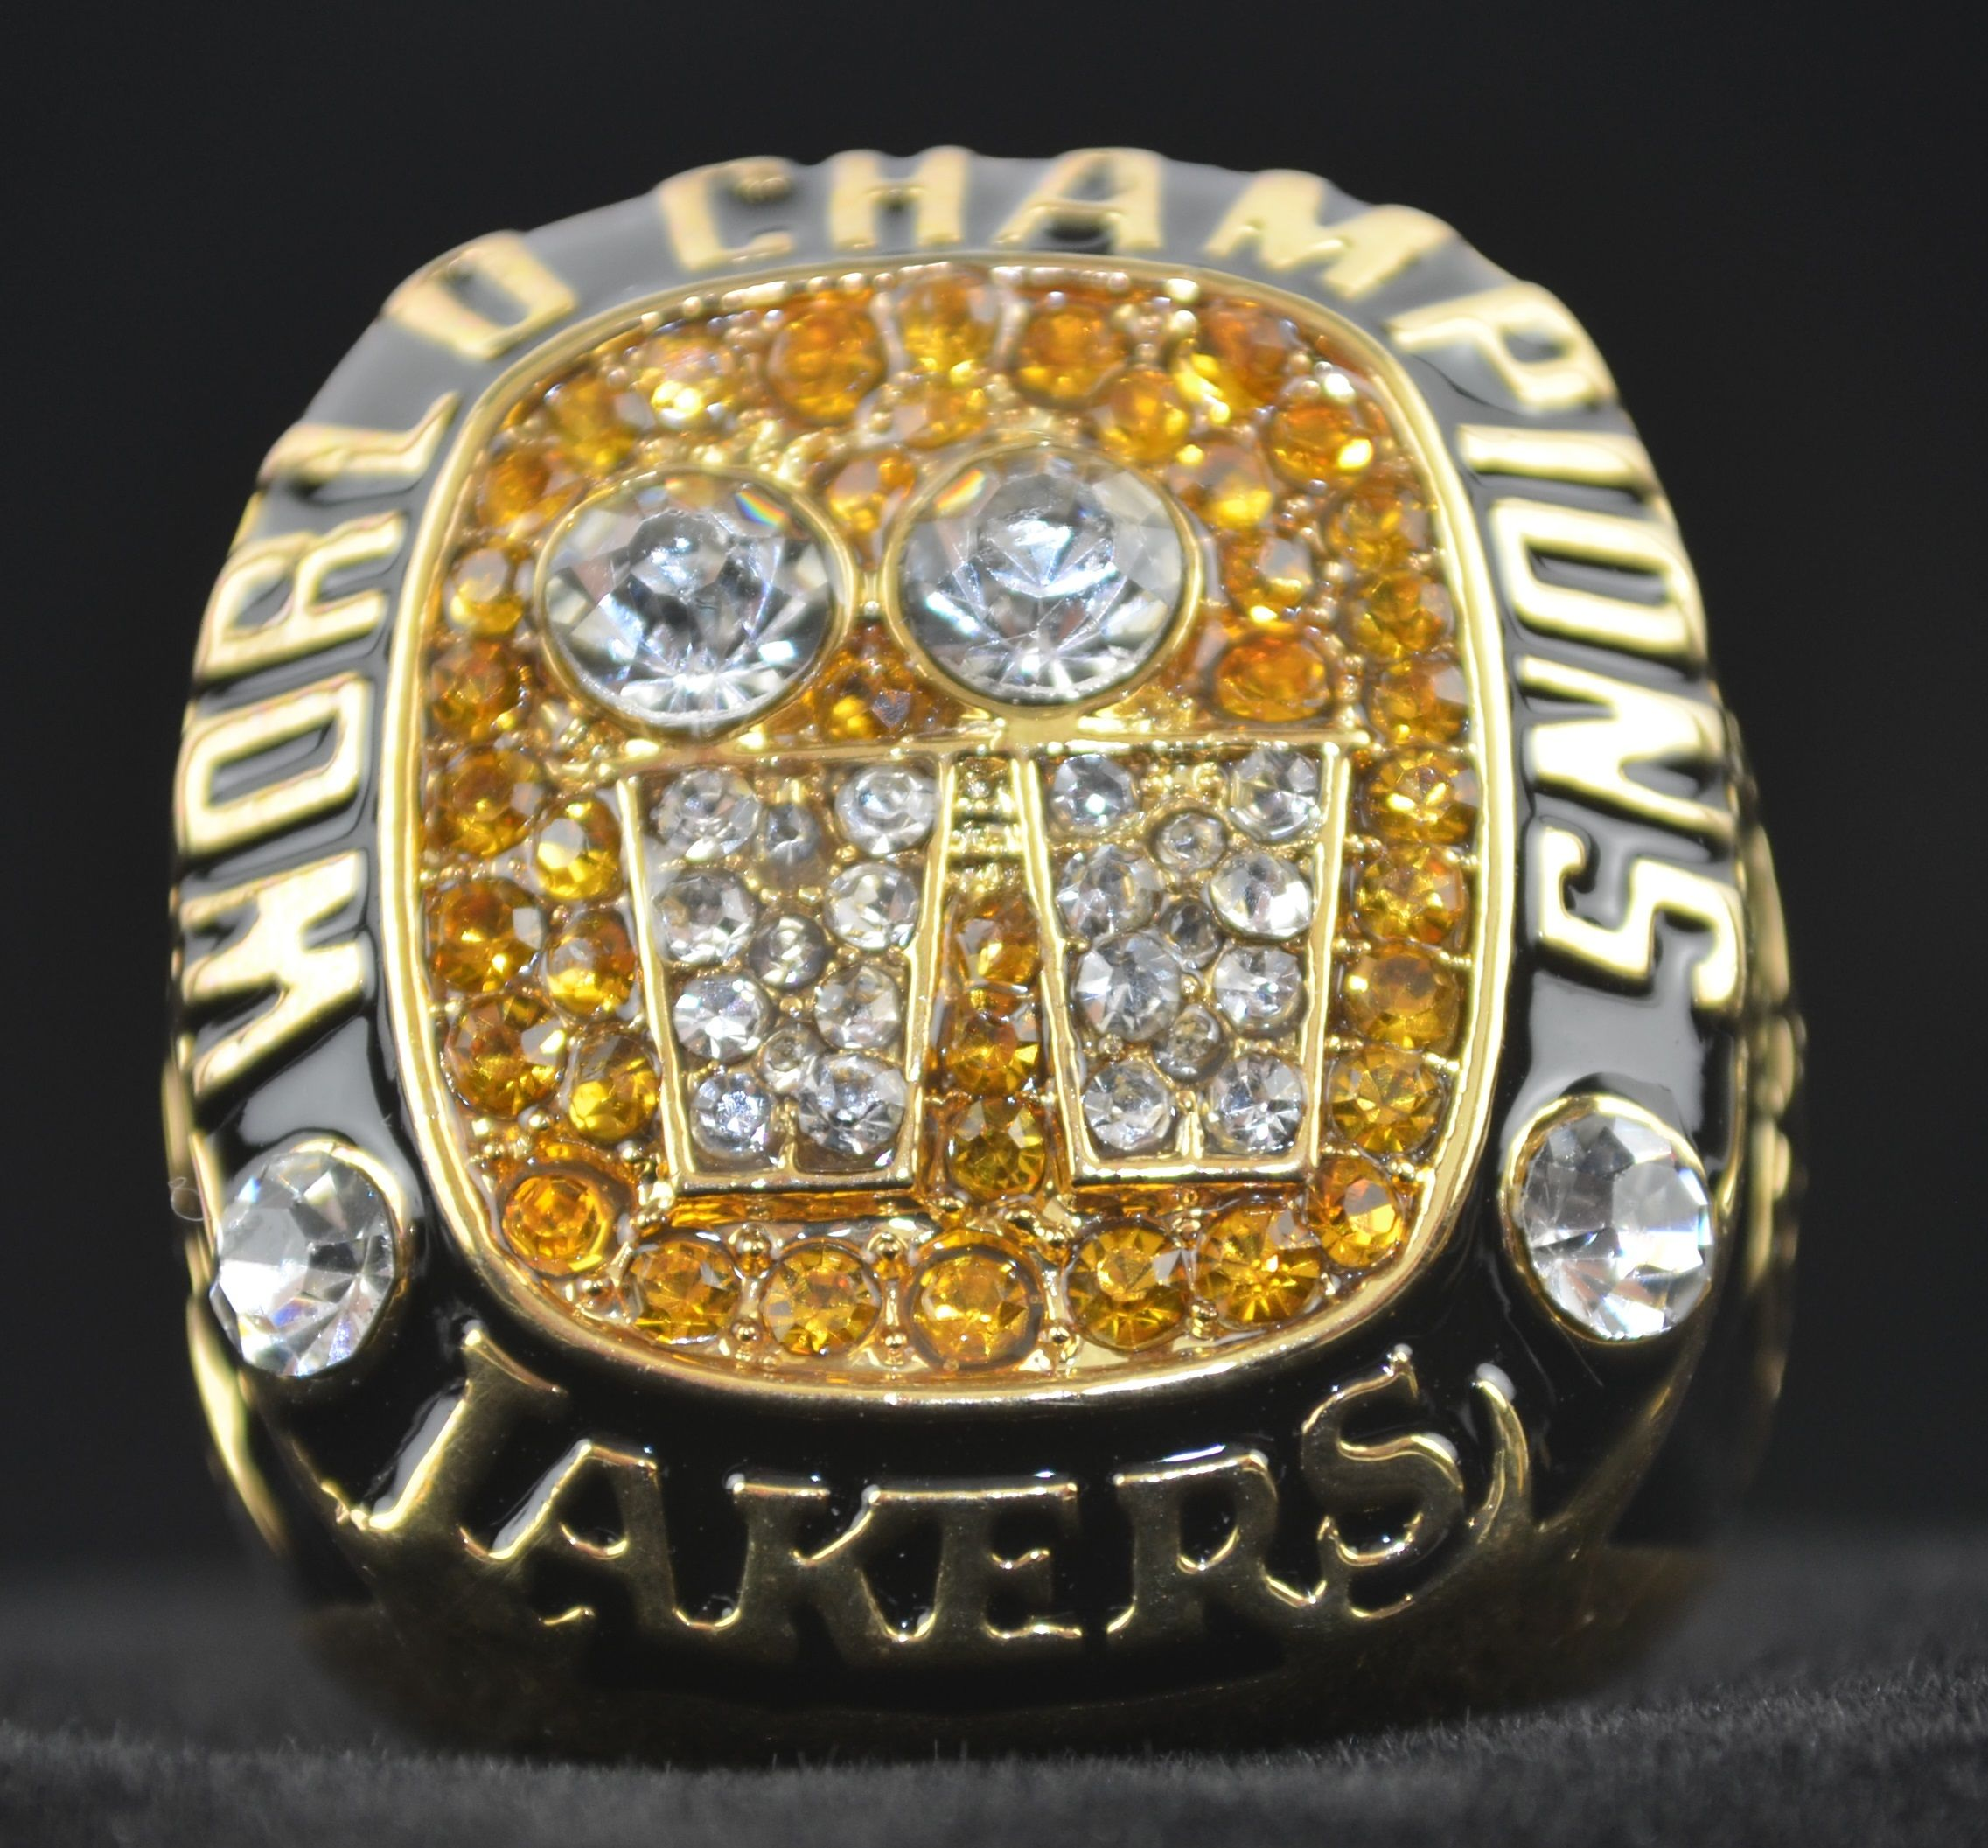 Championship Rings Shaq Replica Rings Championship a